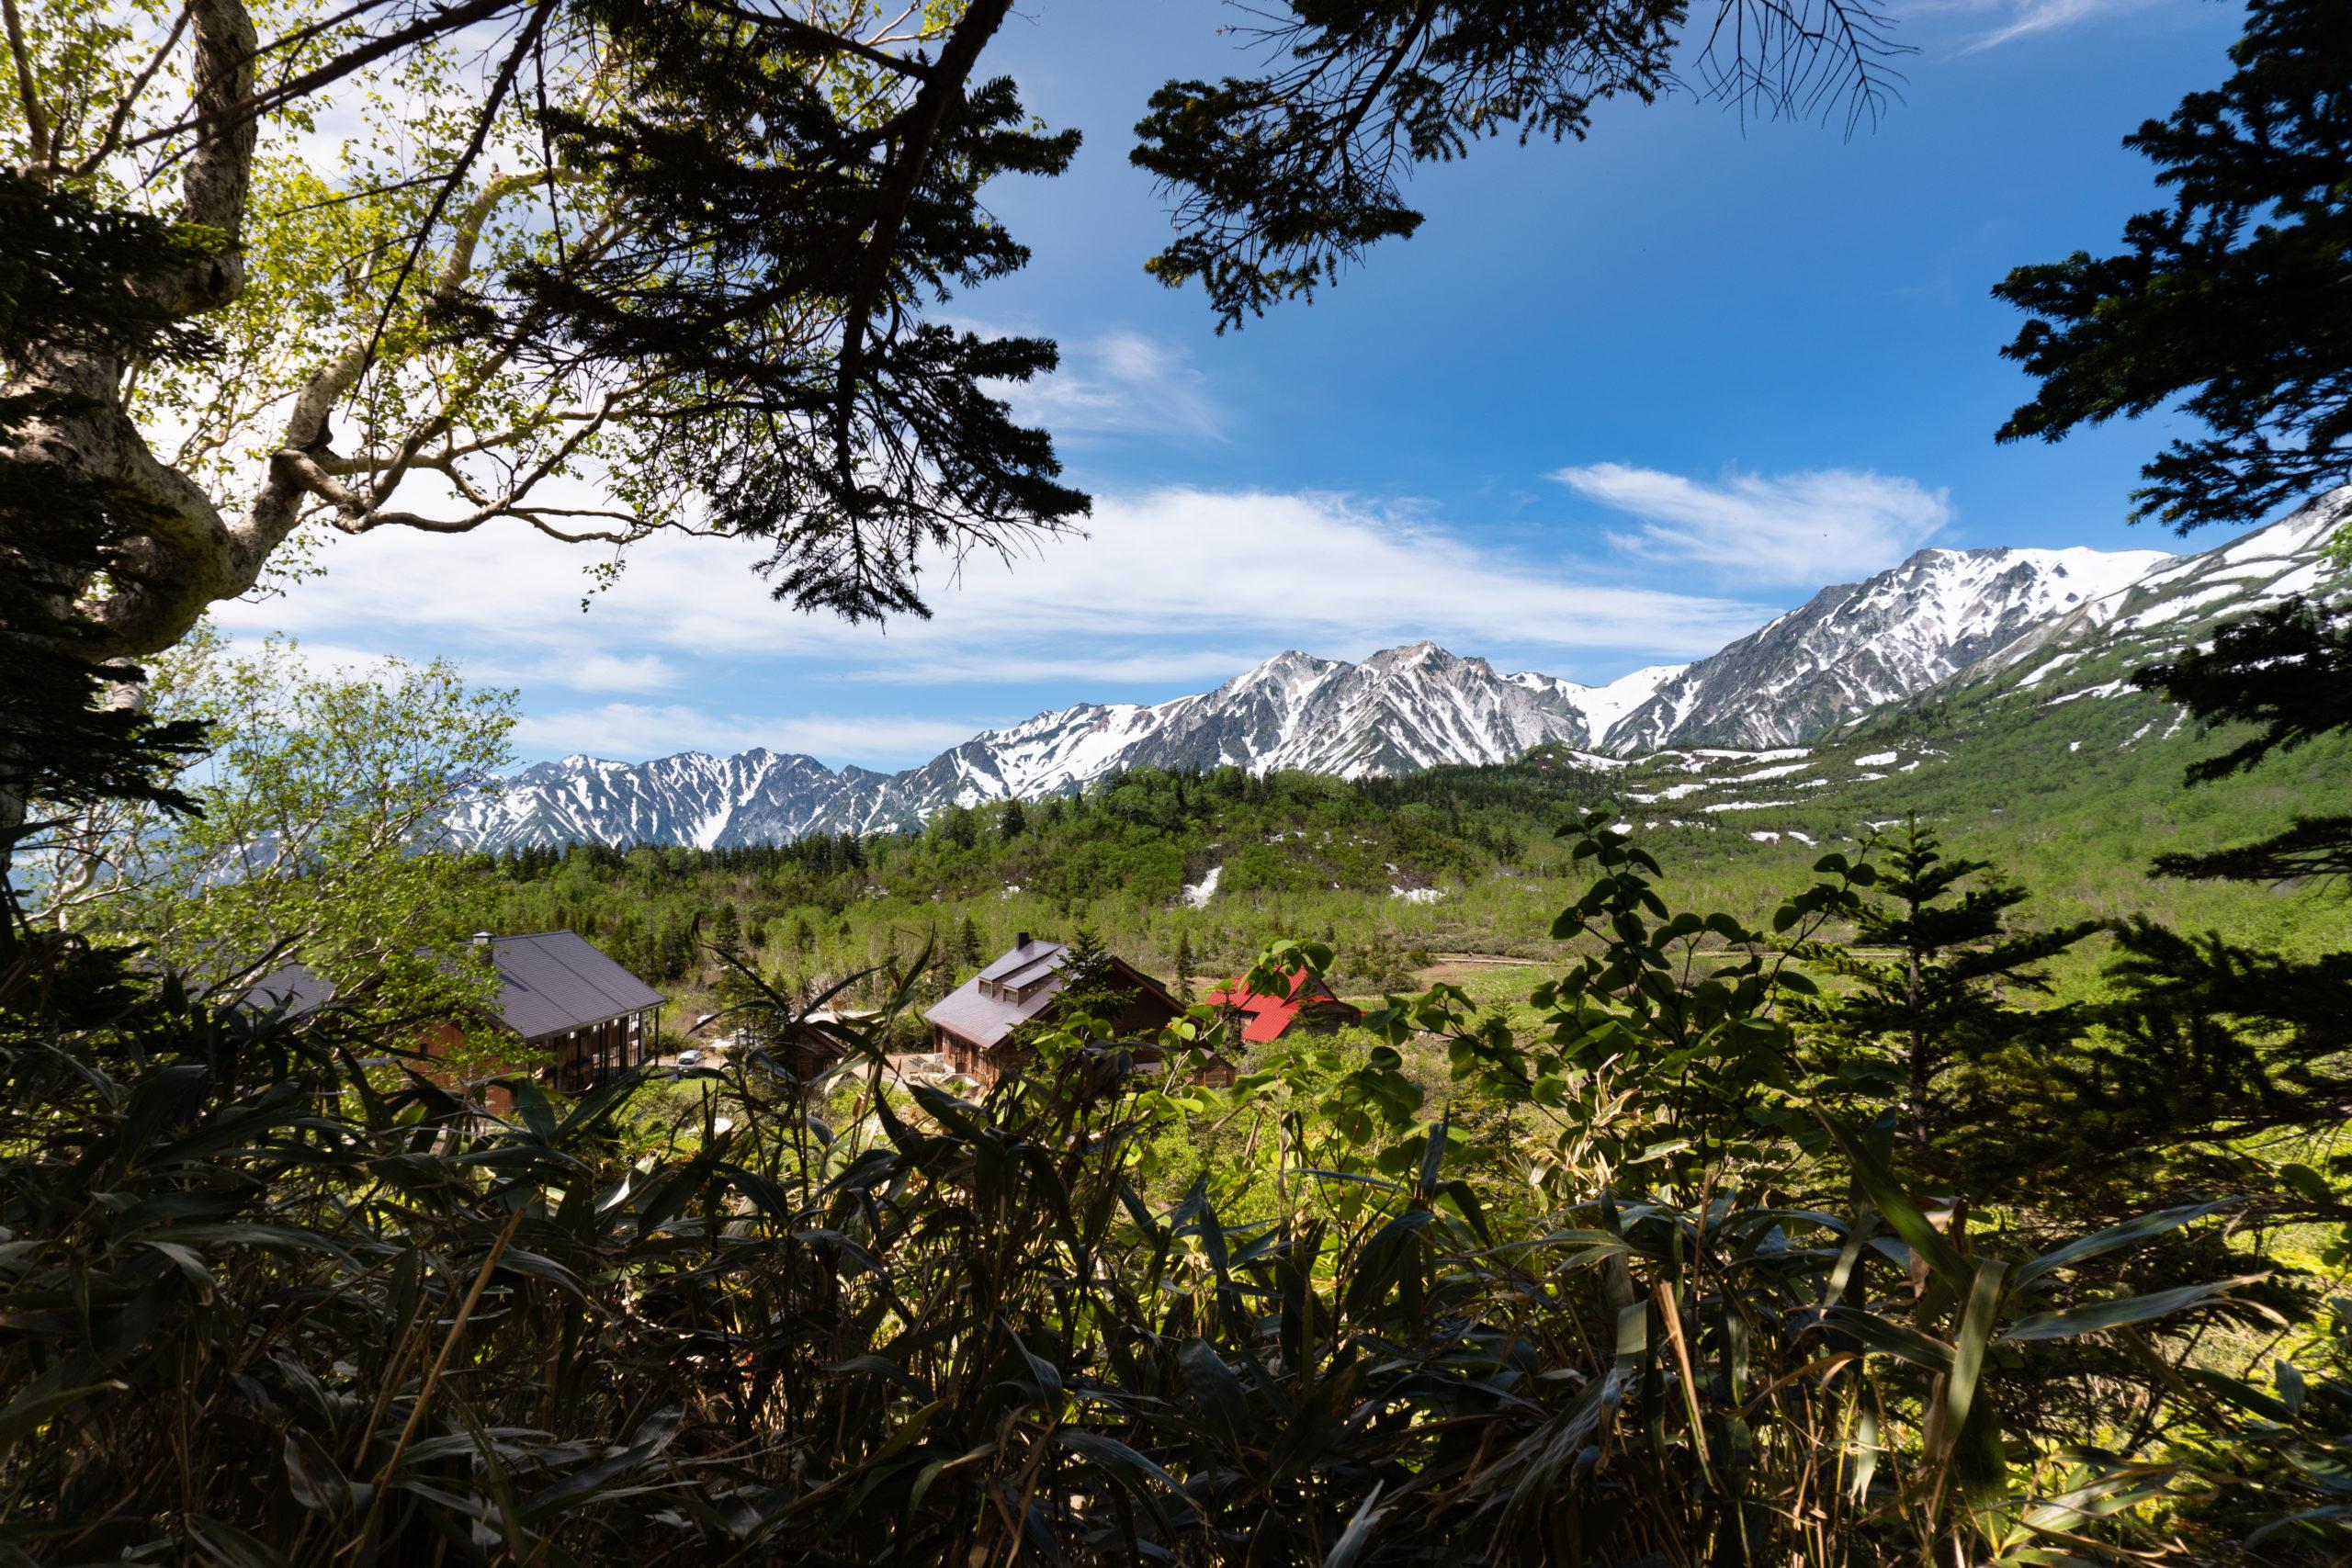 Tendu no Hara Hike - Tsugaike Hiking June 17th (23 of 40)